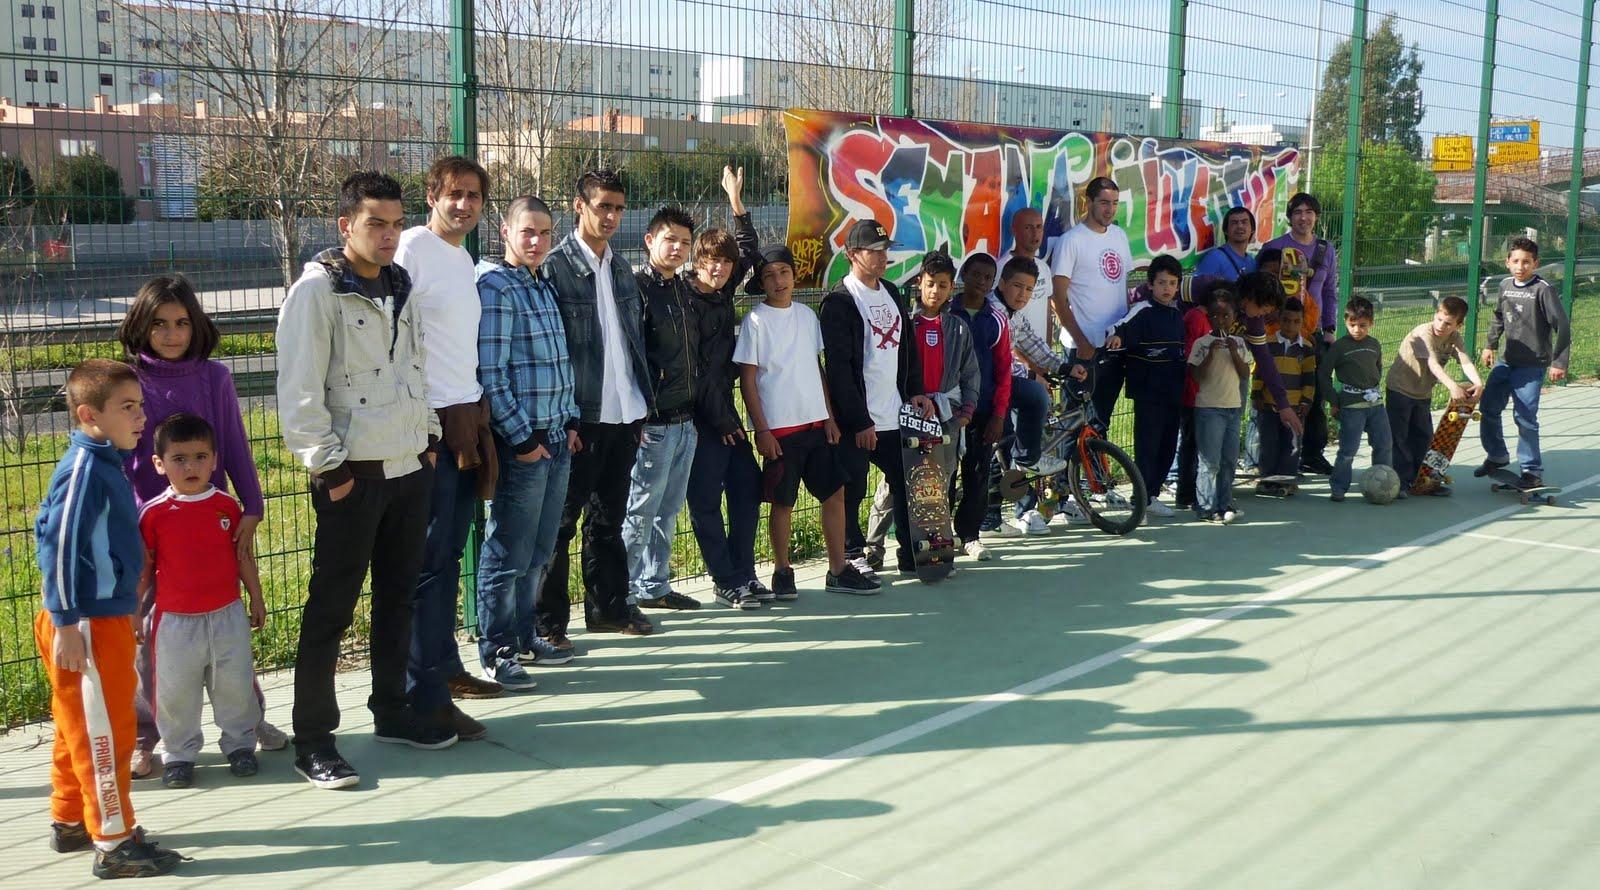 Semana da Juventude no Bairro da Boavista 3a786cab78e31